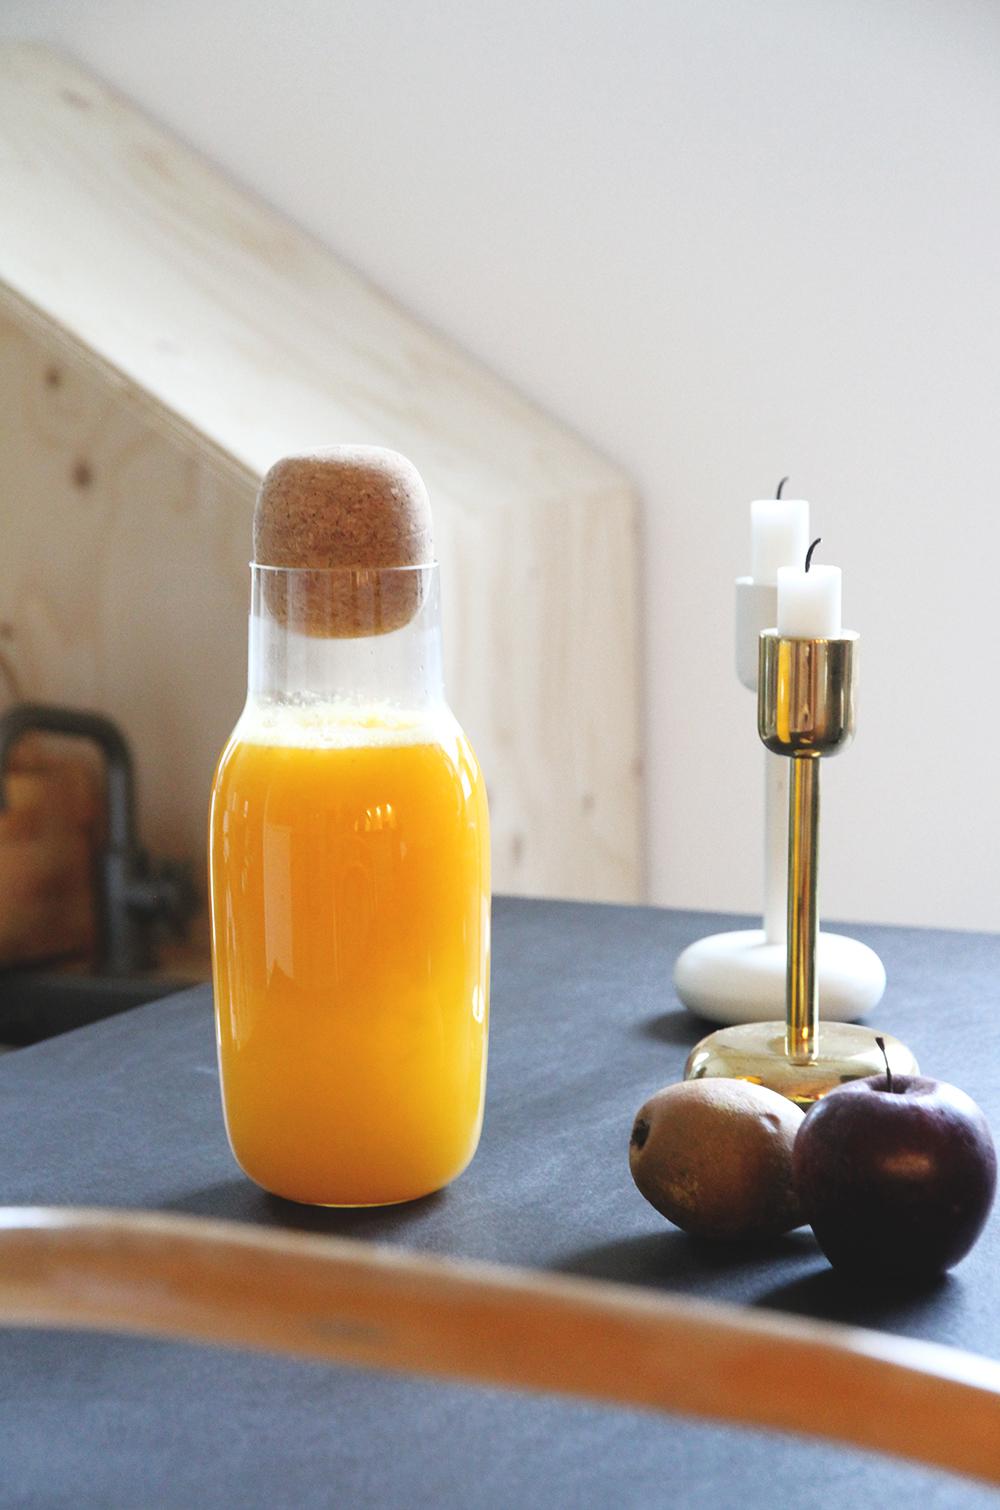 appelsiinimehu muuto kaadin hunajaista sisustusblogi keittio